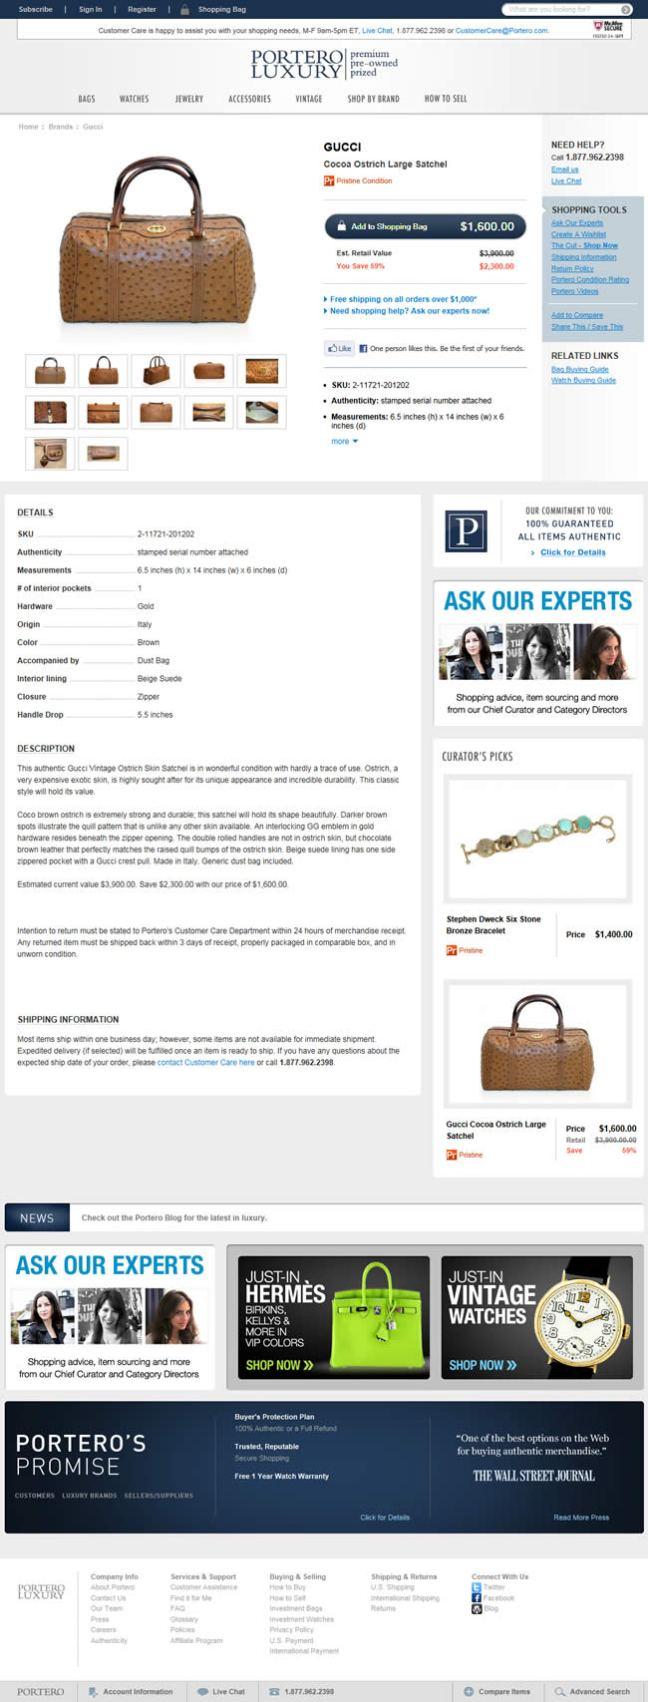 Portero Luxury ecommerce product page design example